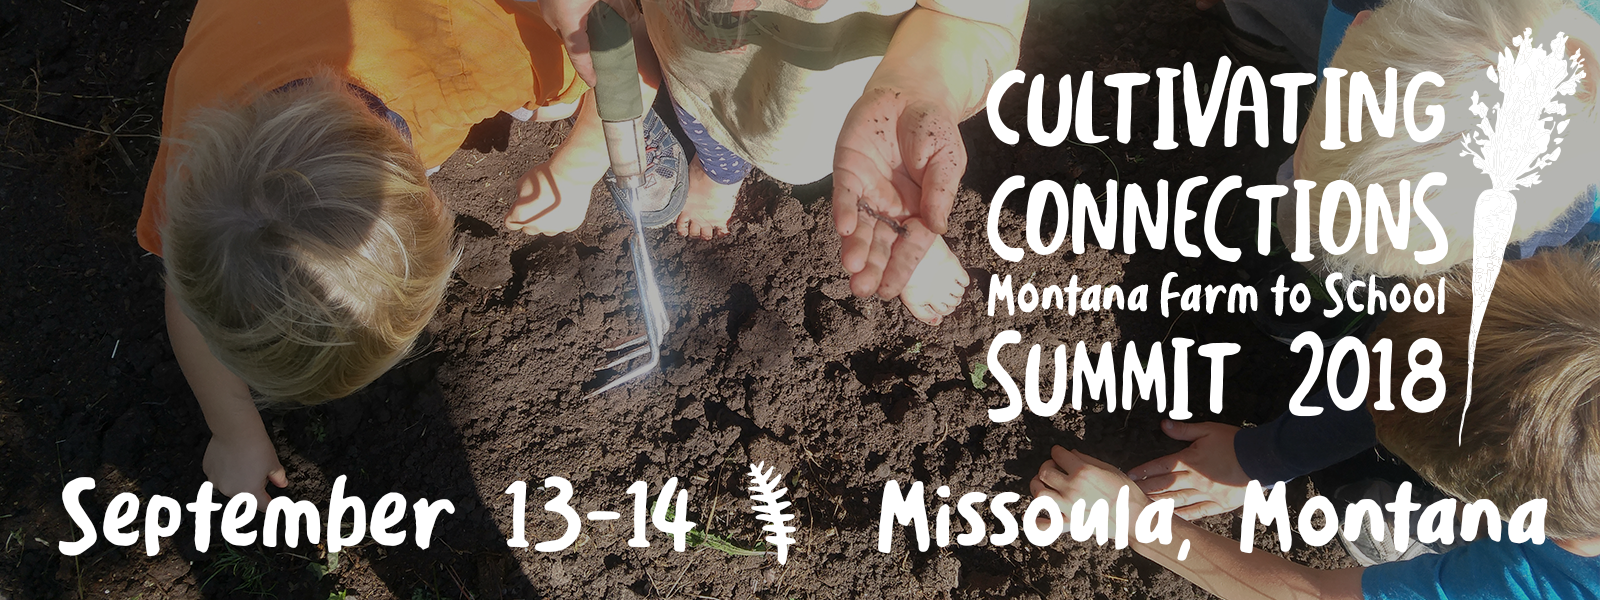 Registration is now open for the MT Farm to School School Summit!